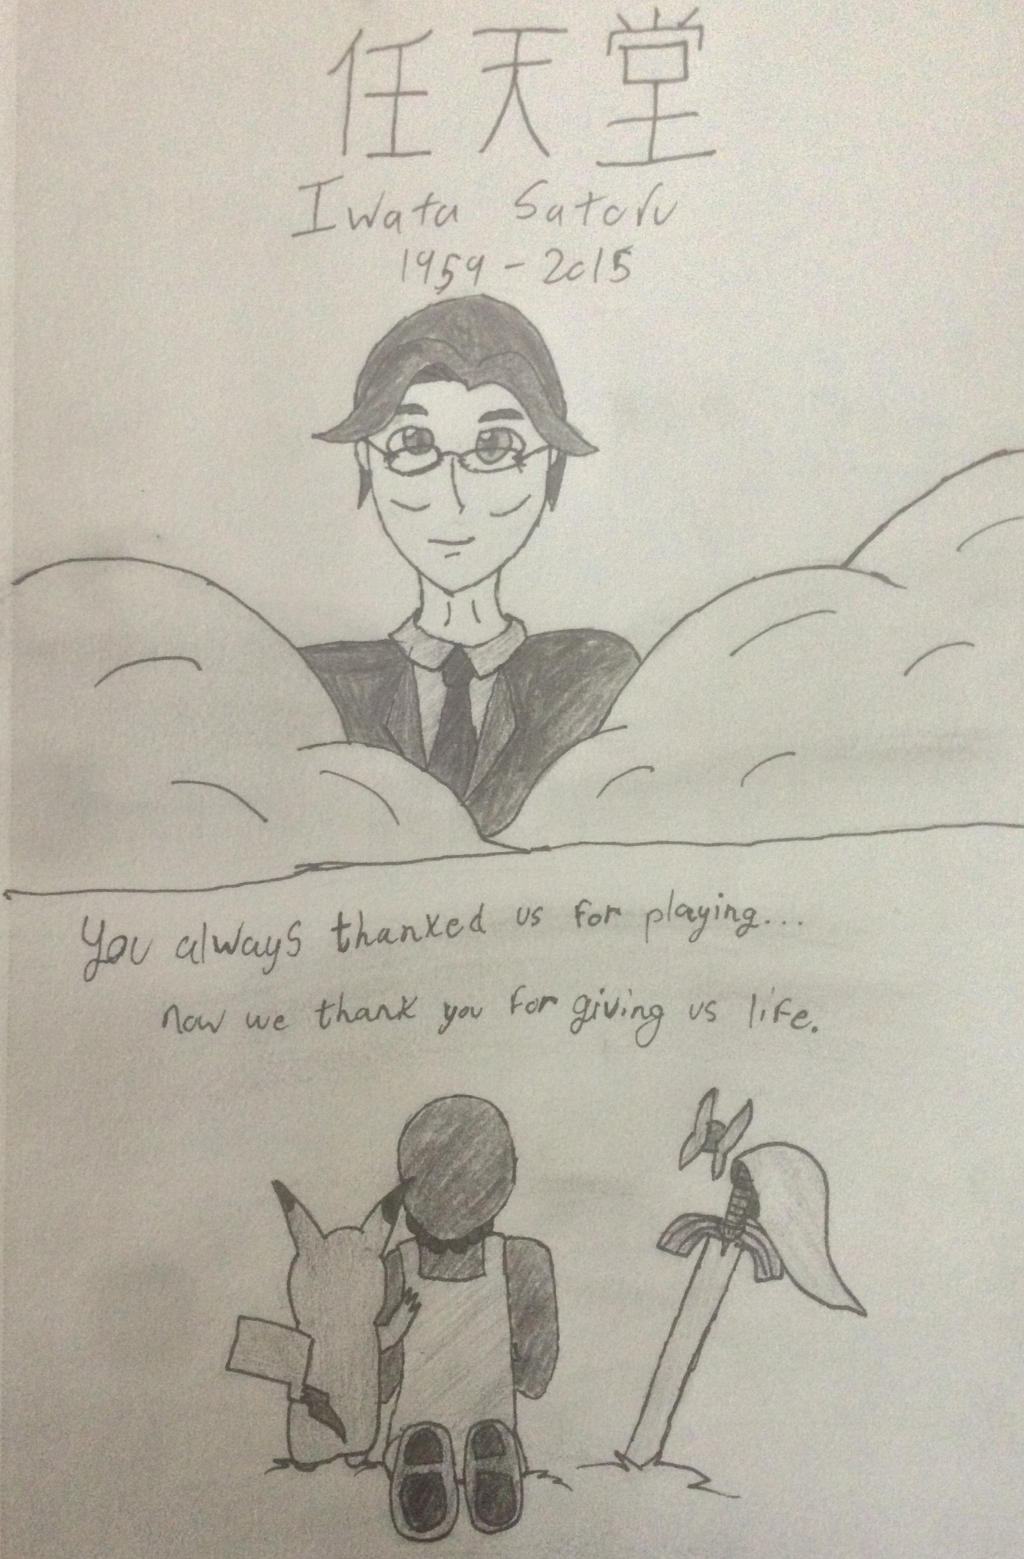 Satoru Iwata by MrEincorporatedd